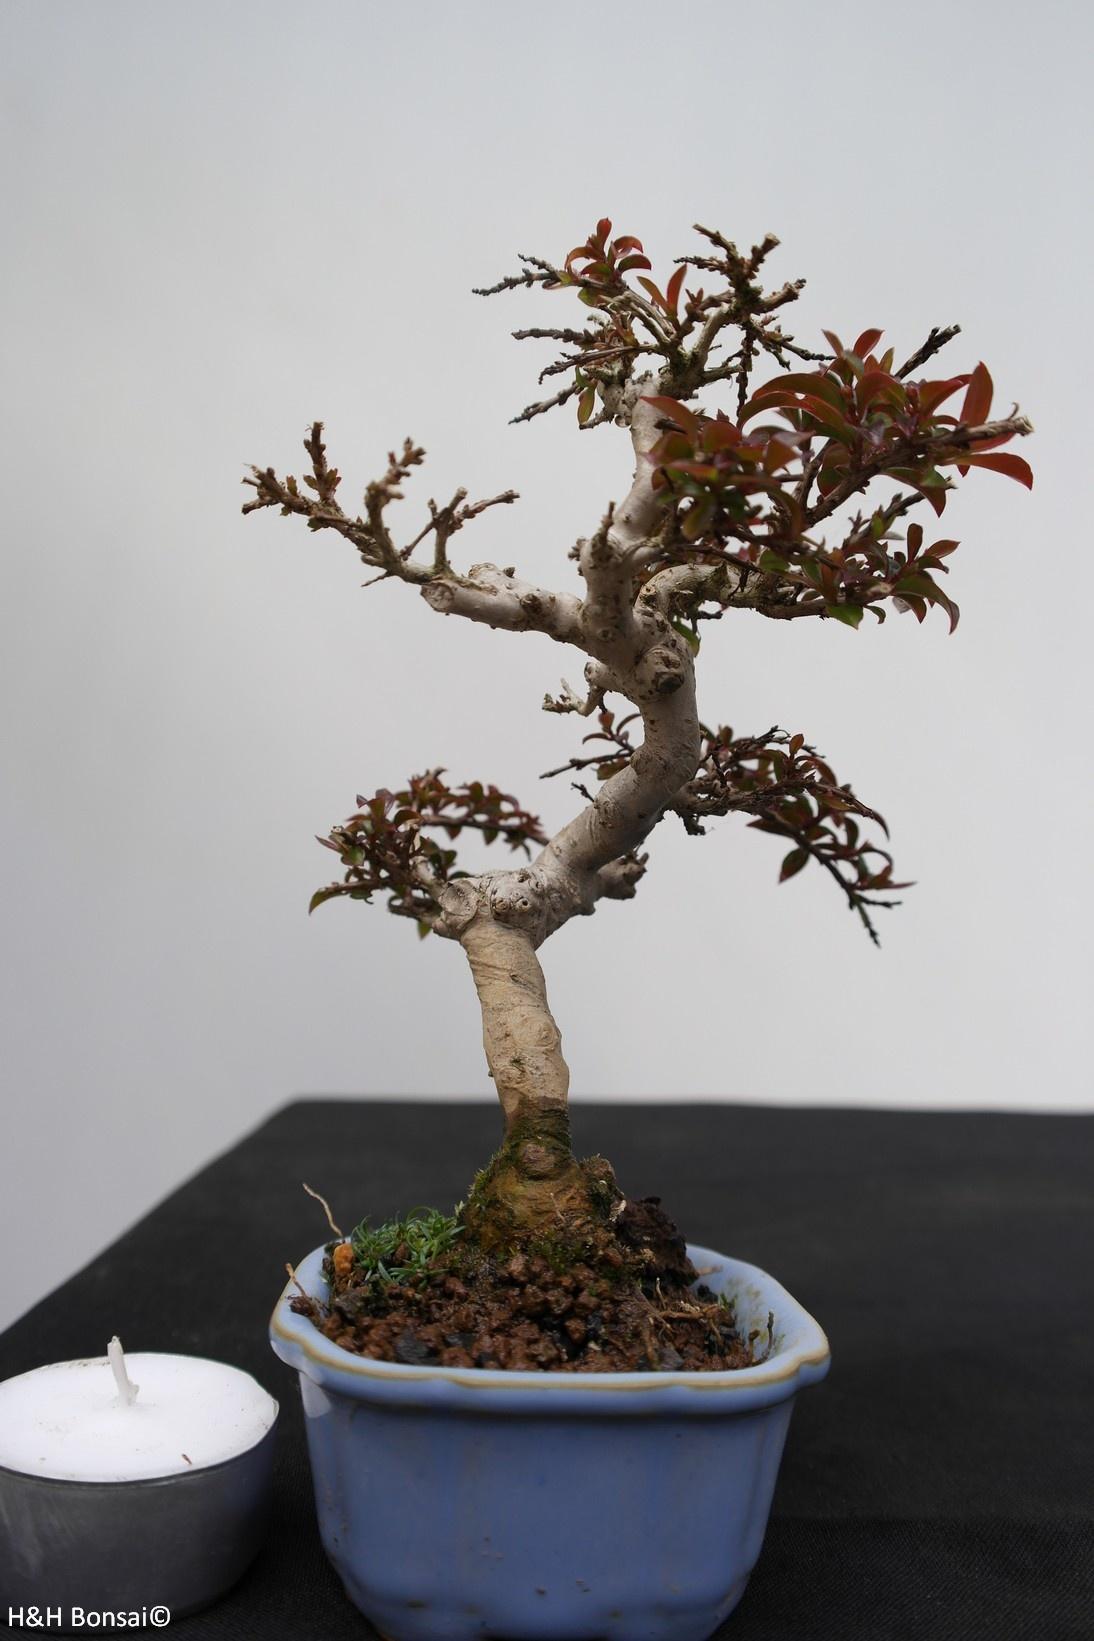 Bonsai Shohin Lagerstroemie,Lagerstroemia, nr. 7788